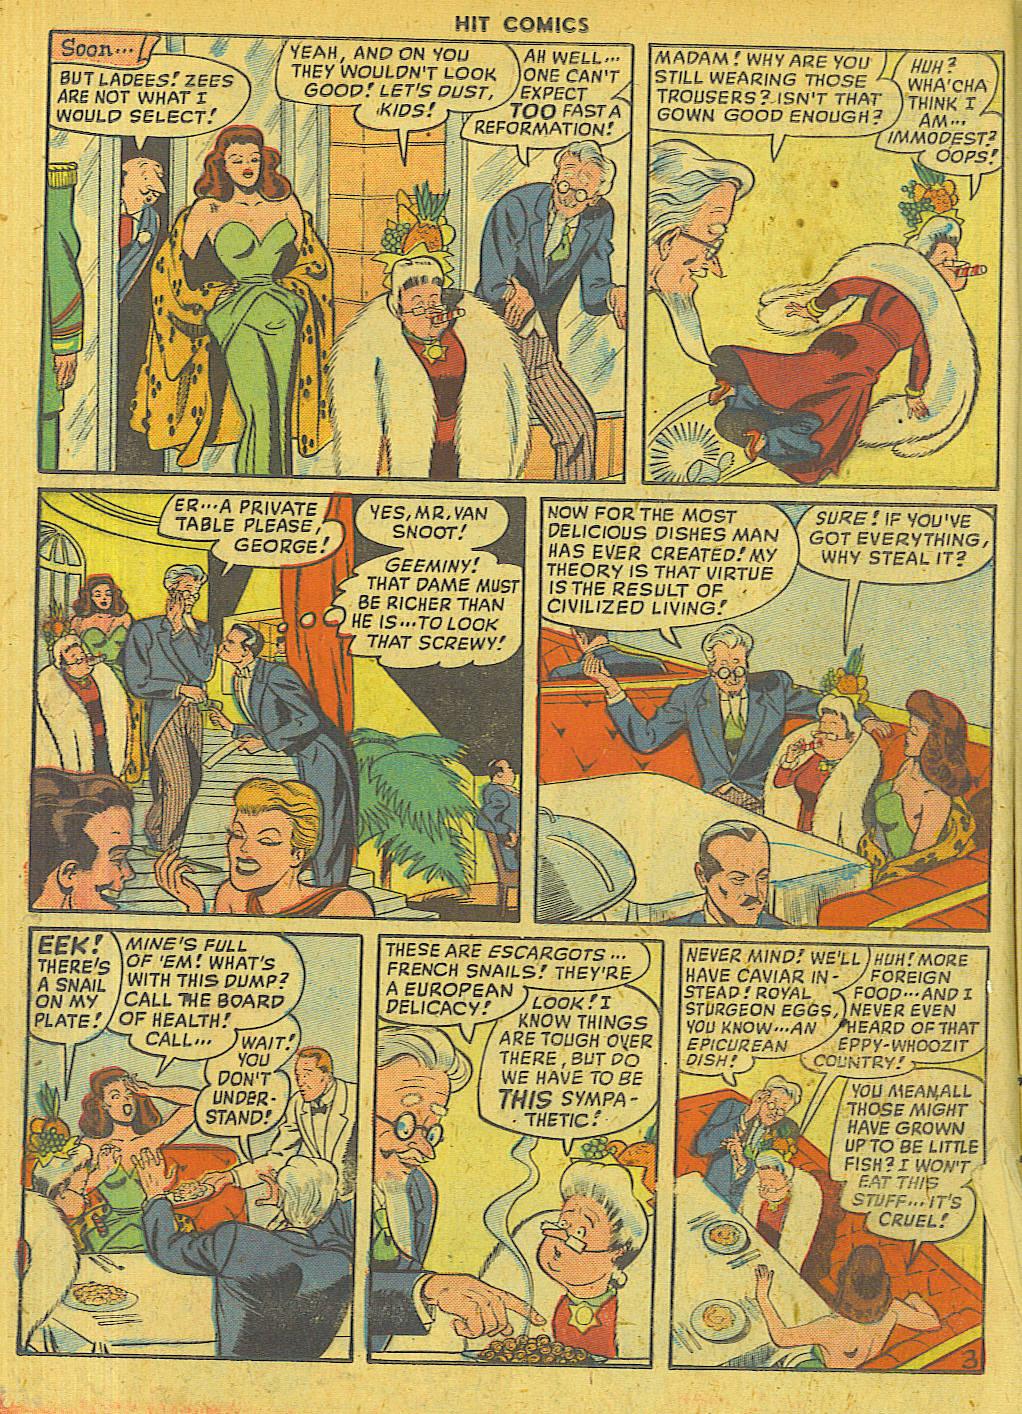 Read online Hit Comics comic -  Issue #56 - 18